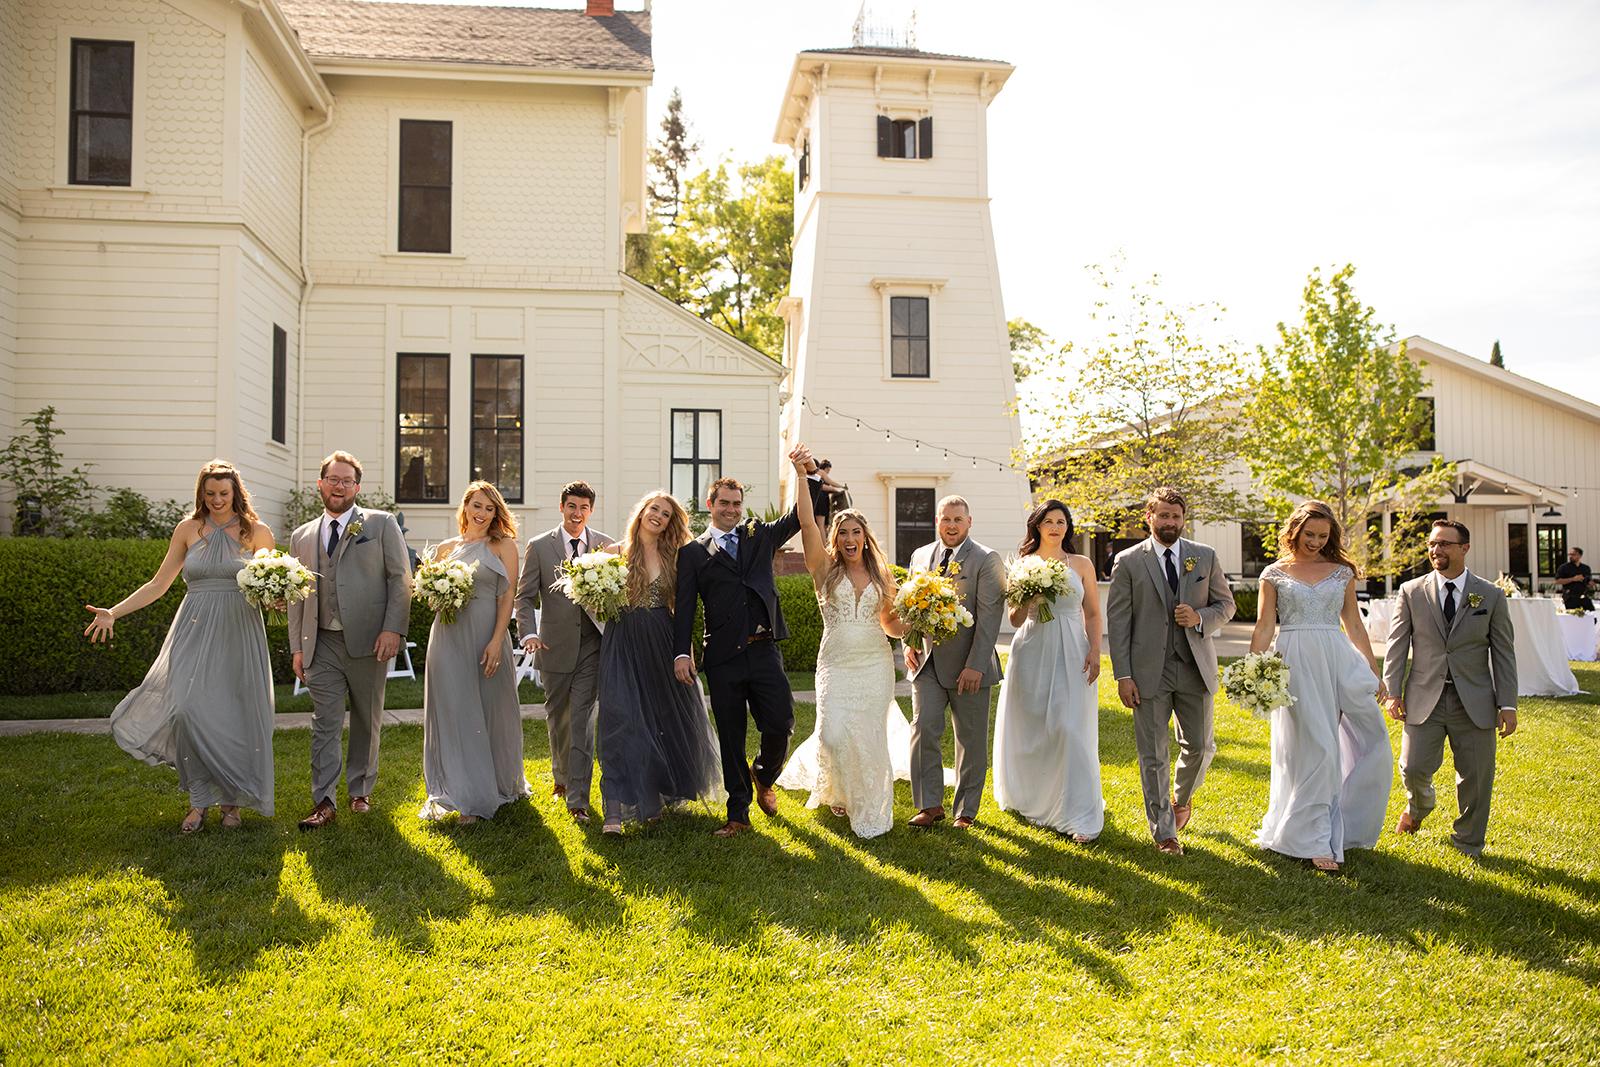 WeddingPhotos-255.jpg